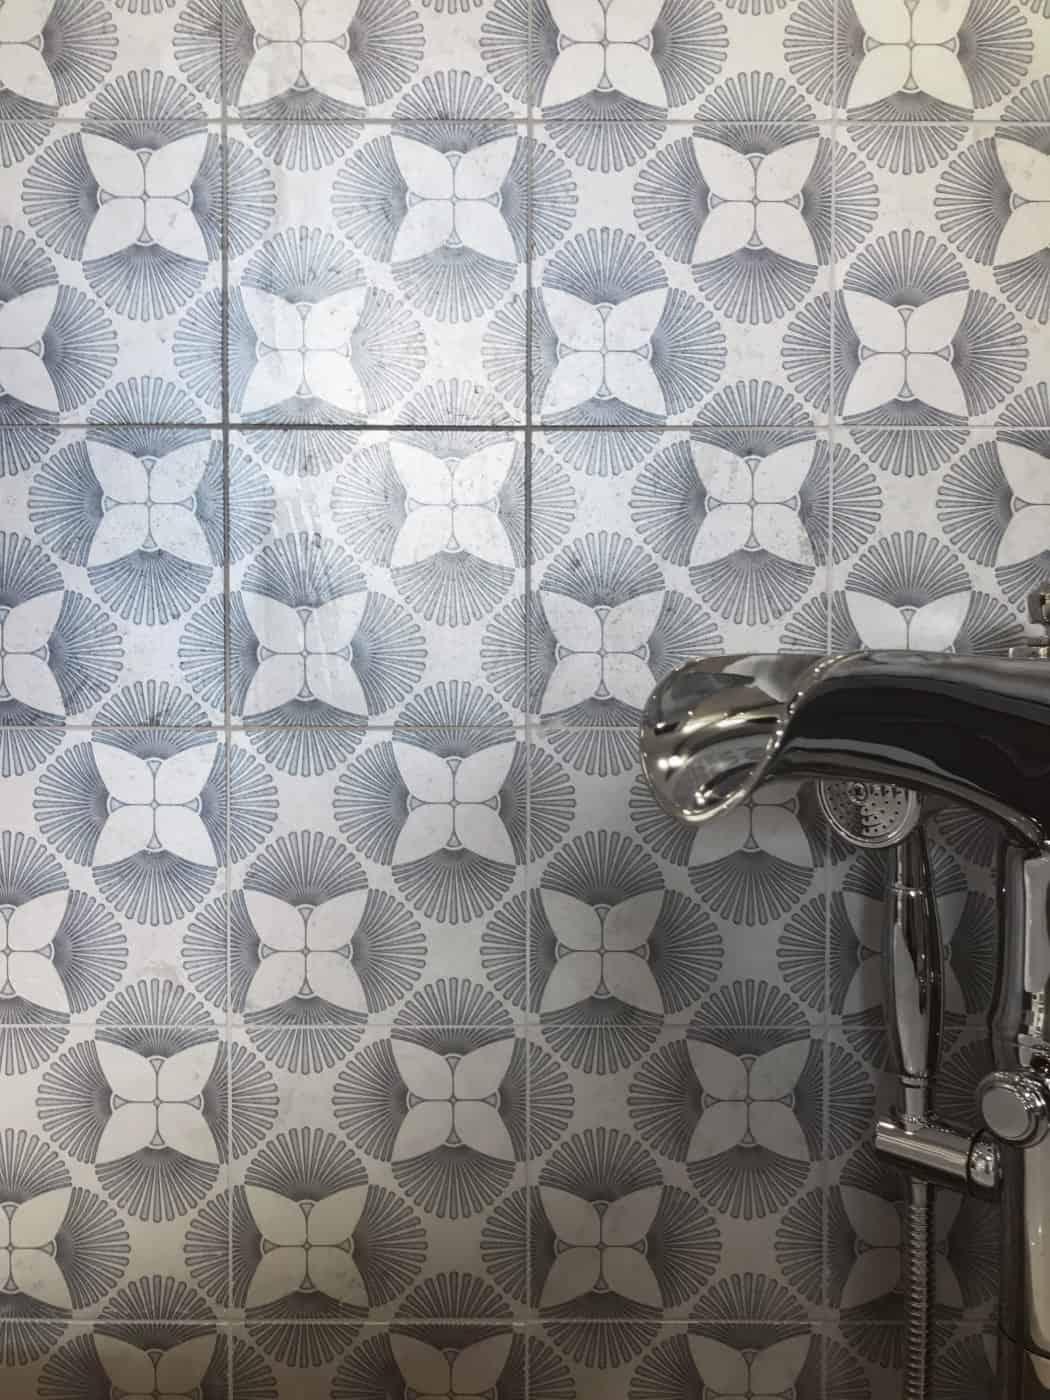 Briolette Pattern (agate) on Silver Luster (bathroom)